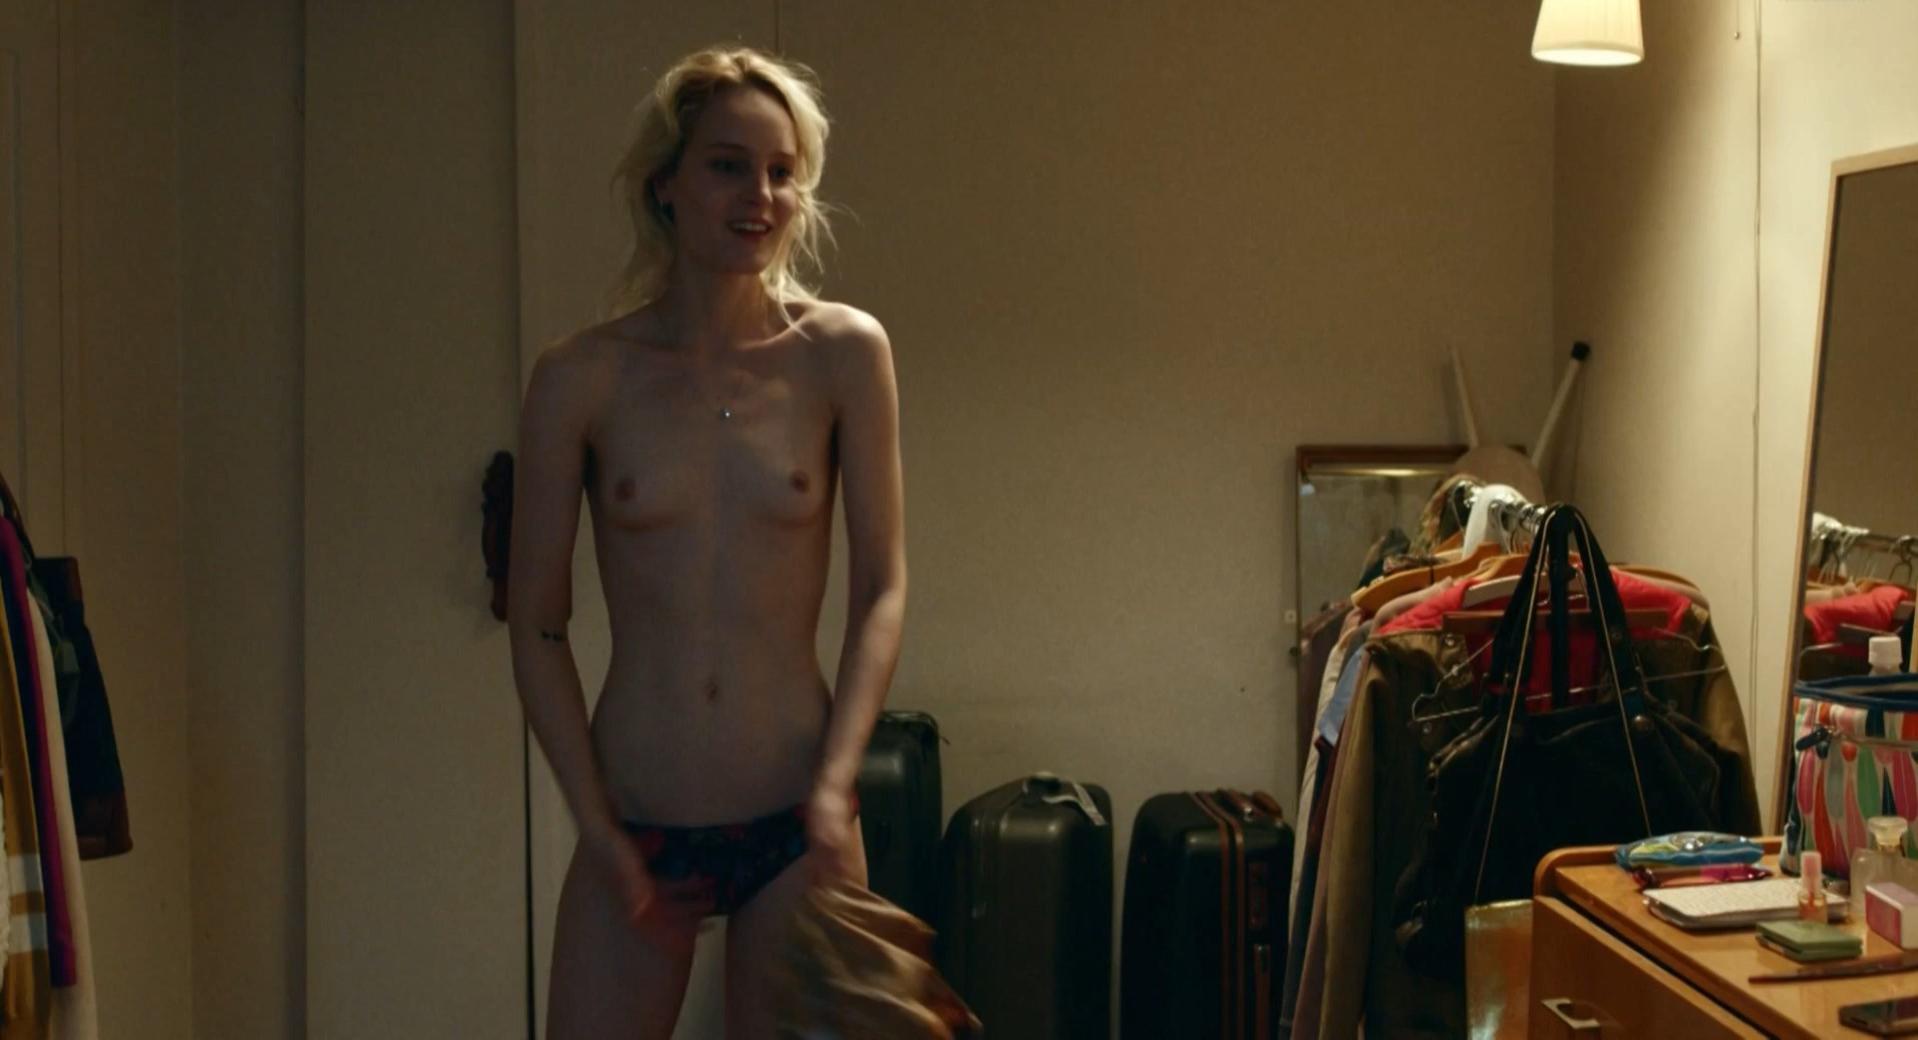 Maria Palm nude, Charlotte Tomaszewska nude - The Model (2016)